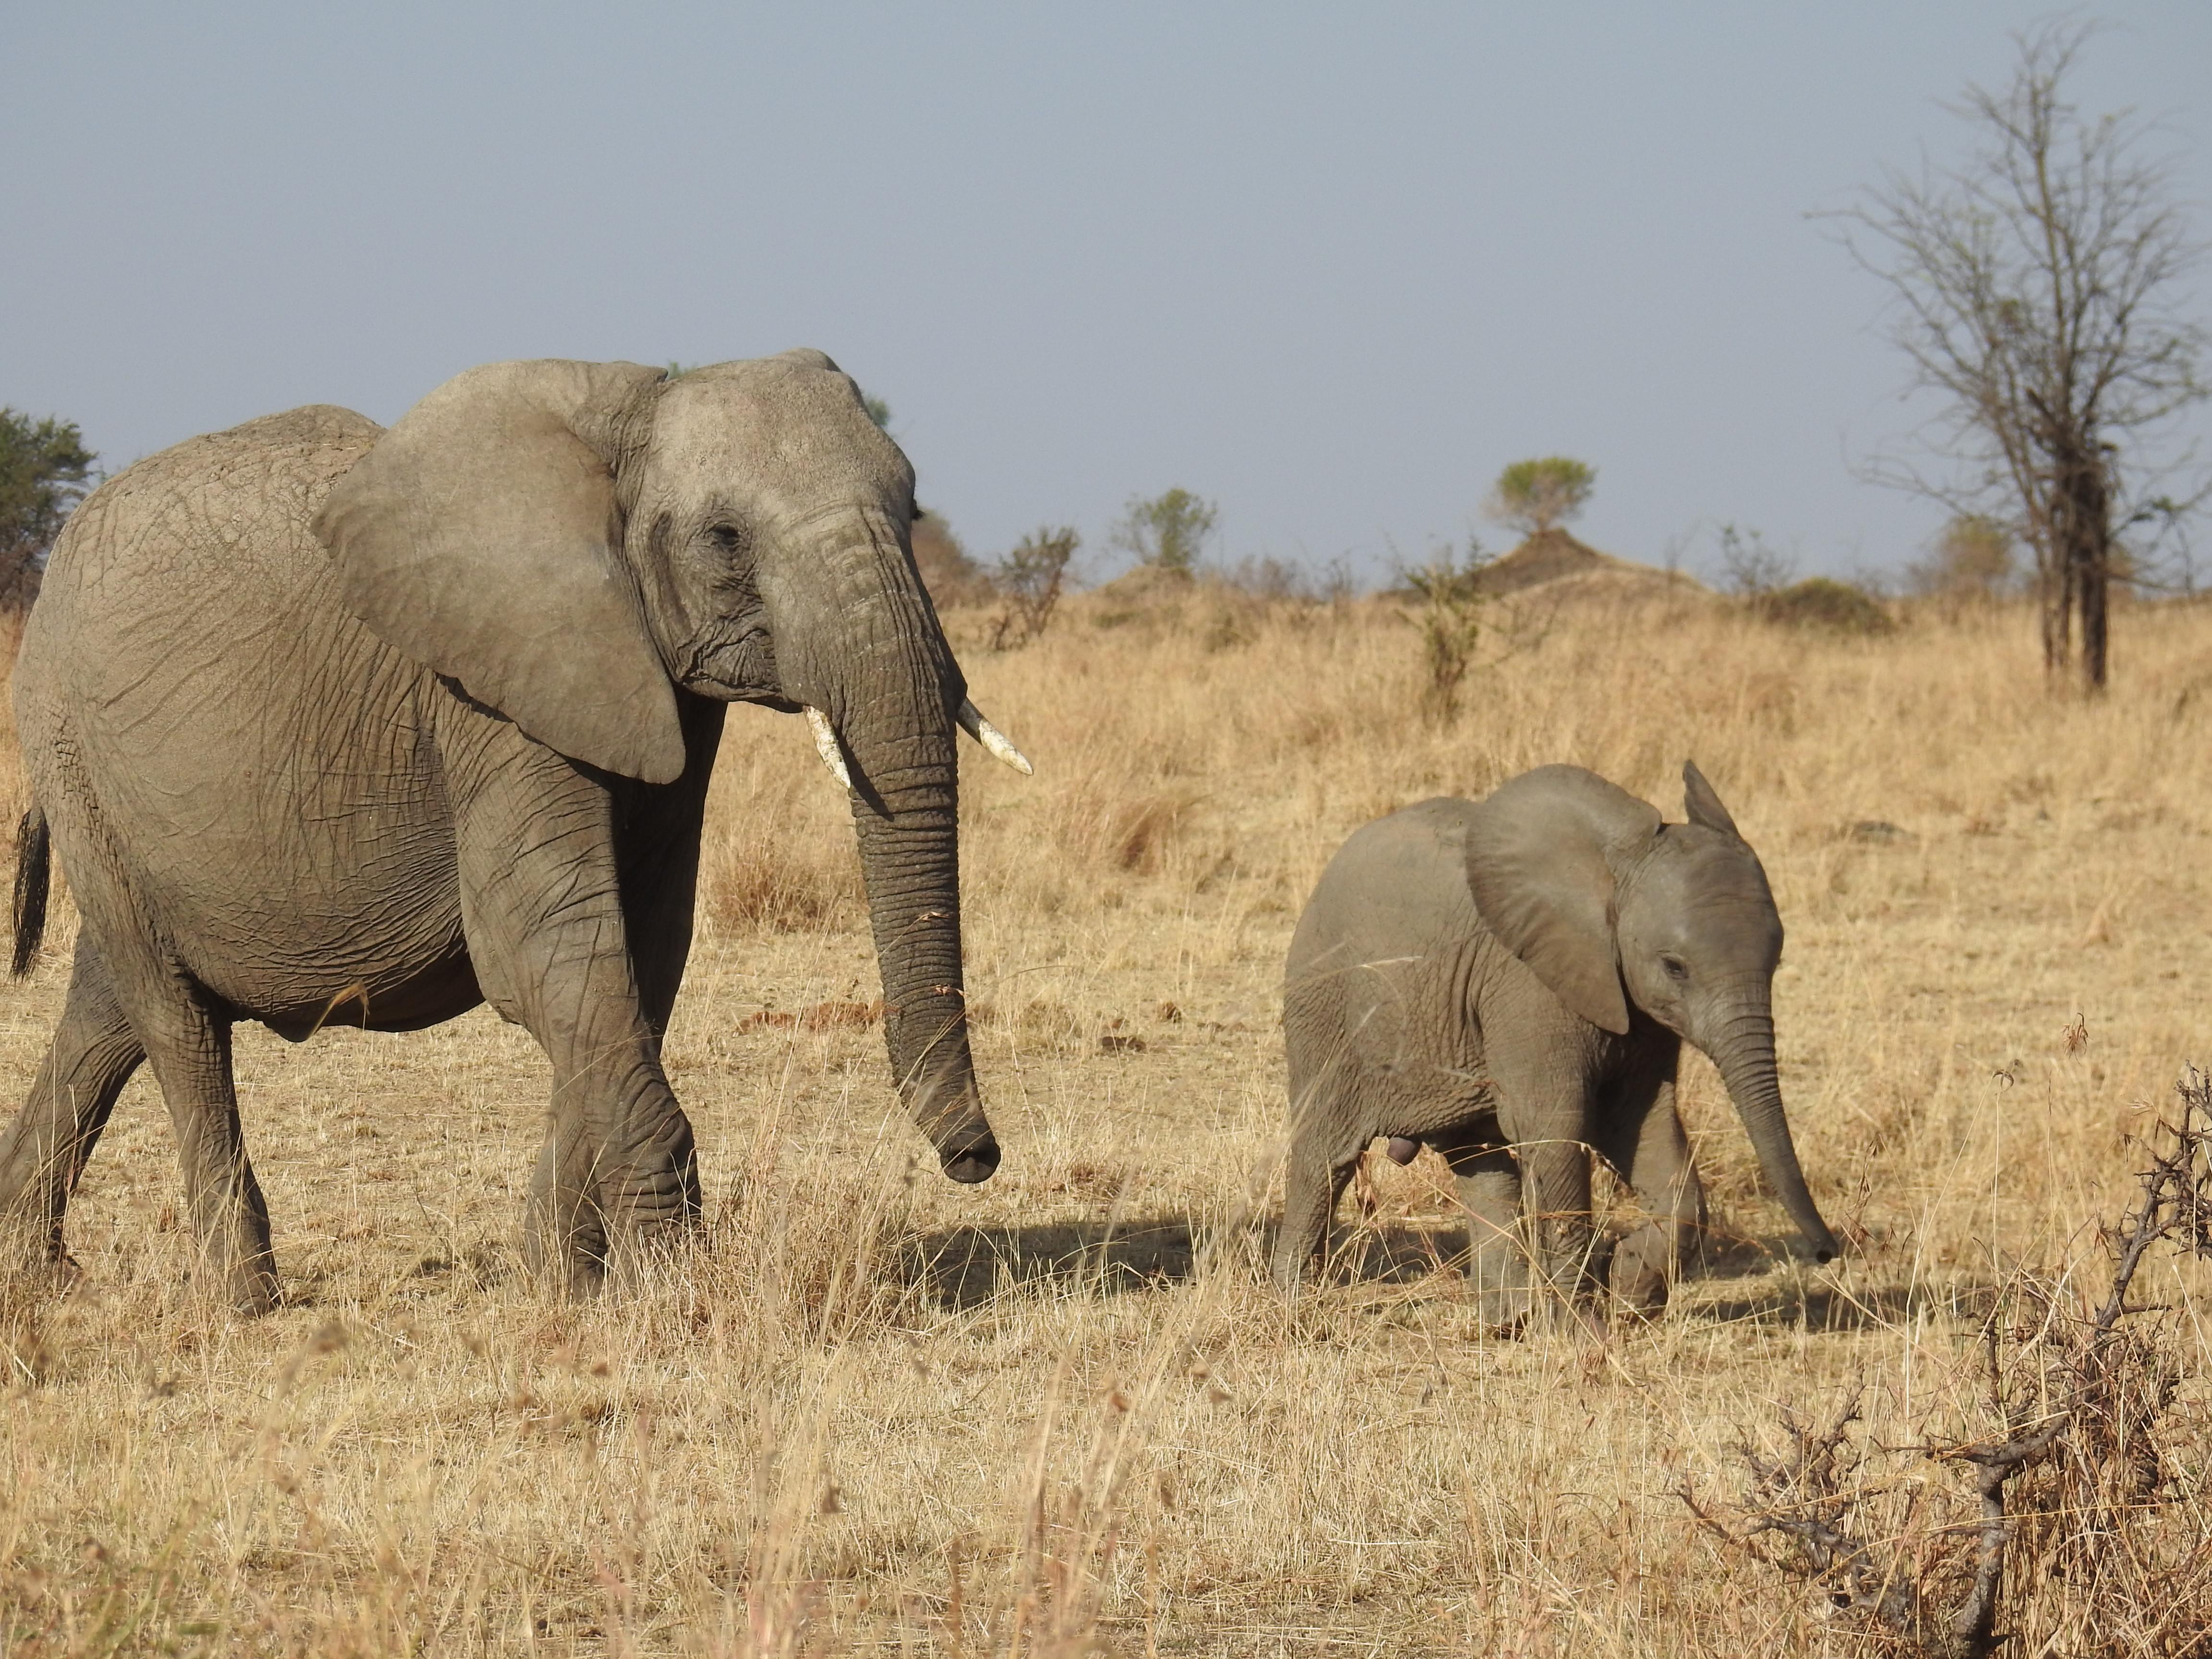 Elephant_calf_1.jpg